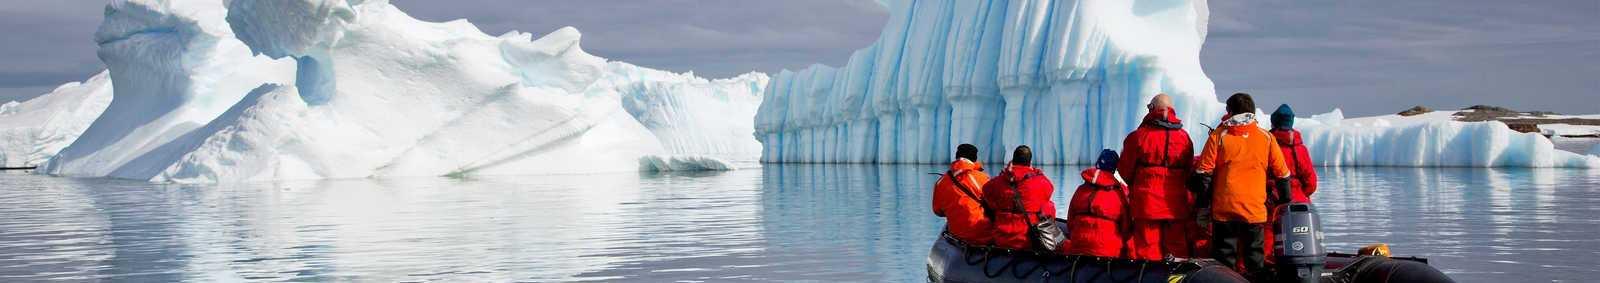 Exploring the Antarctic